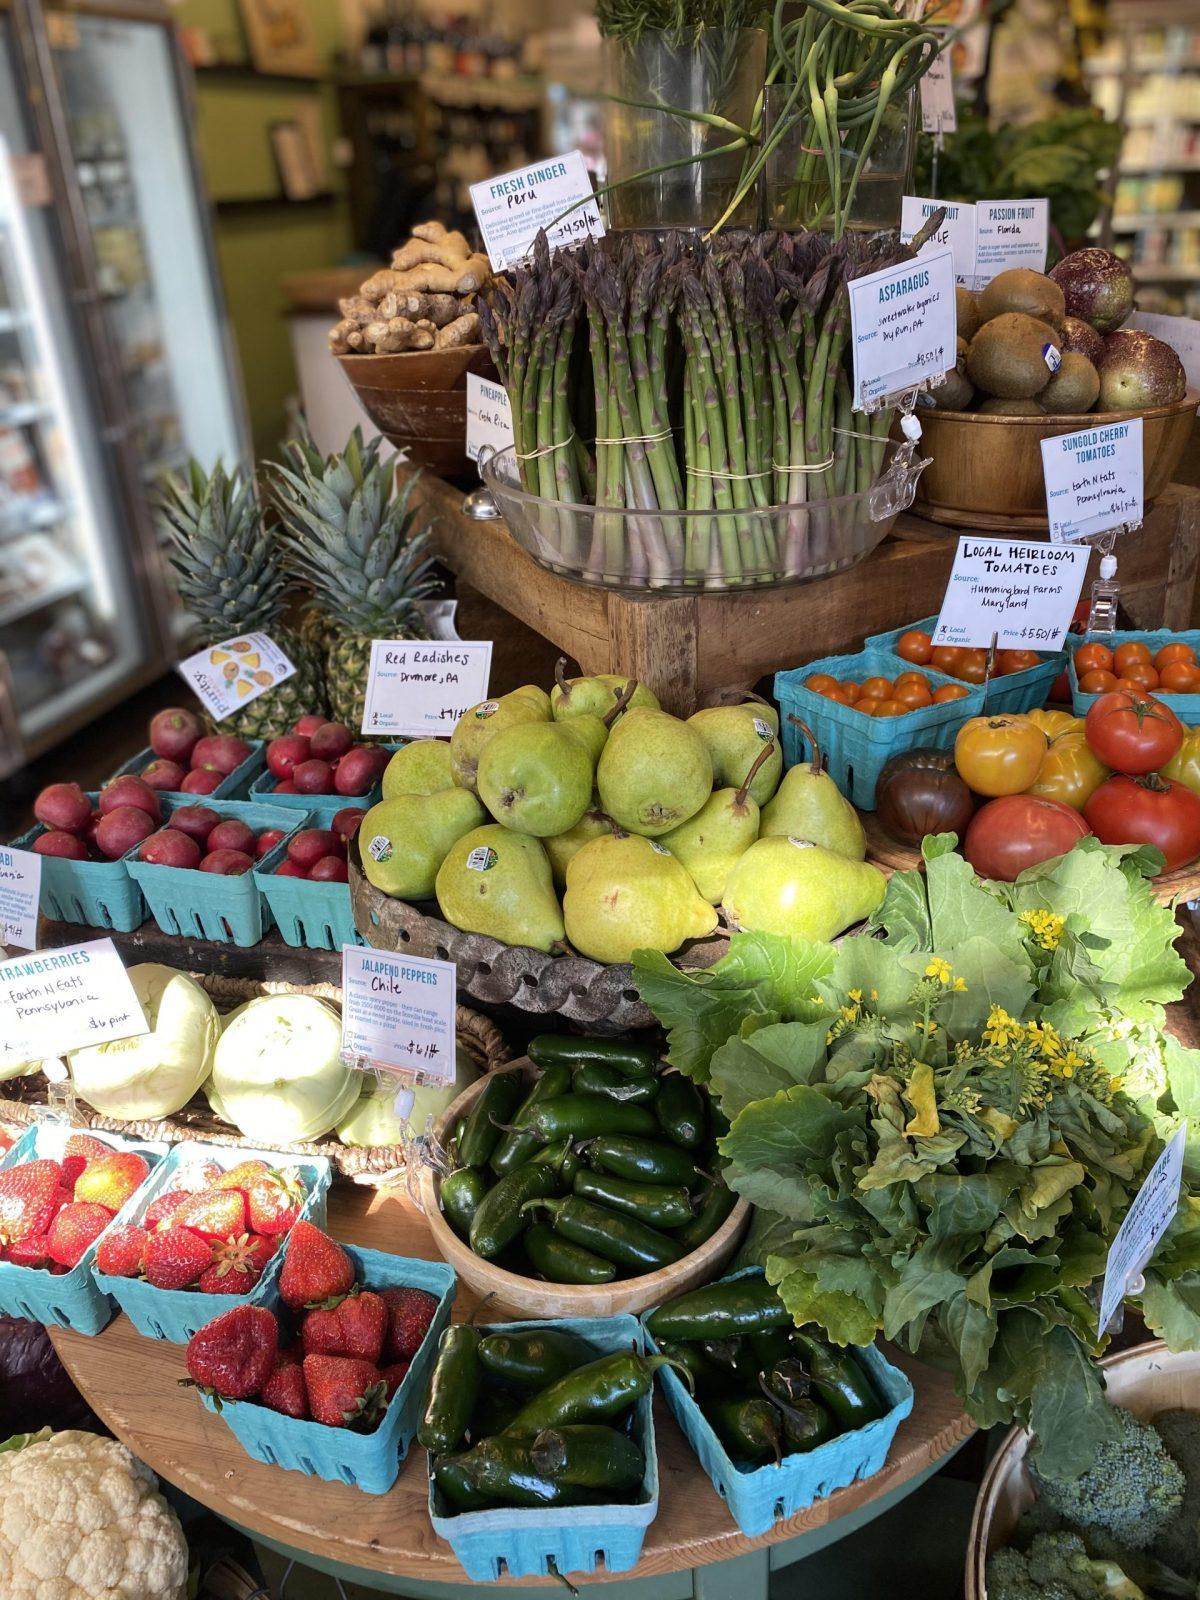 Produce at Each Peach Market